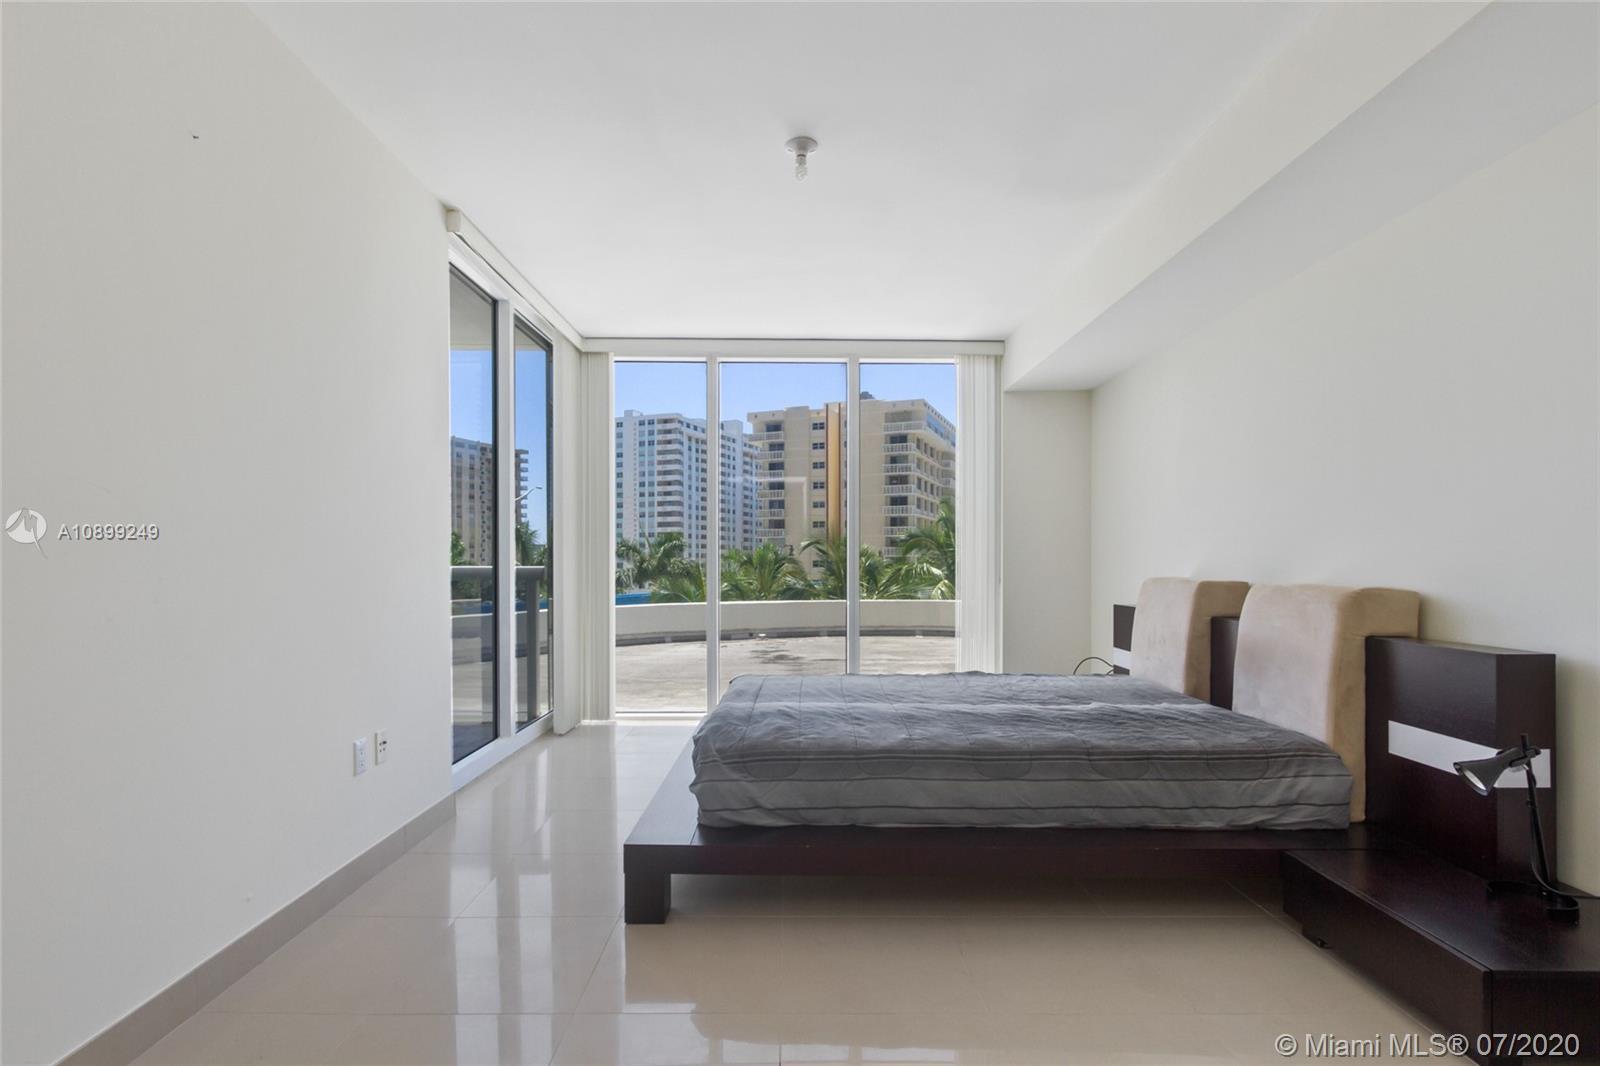 407 3 / 3 1571 sq. ft. $ 2020-07-24 0 Photo